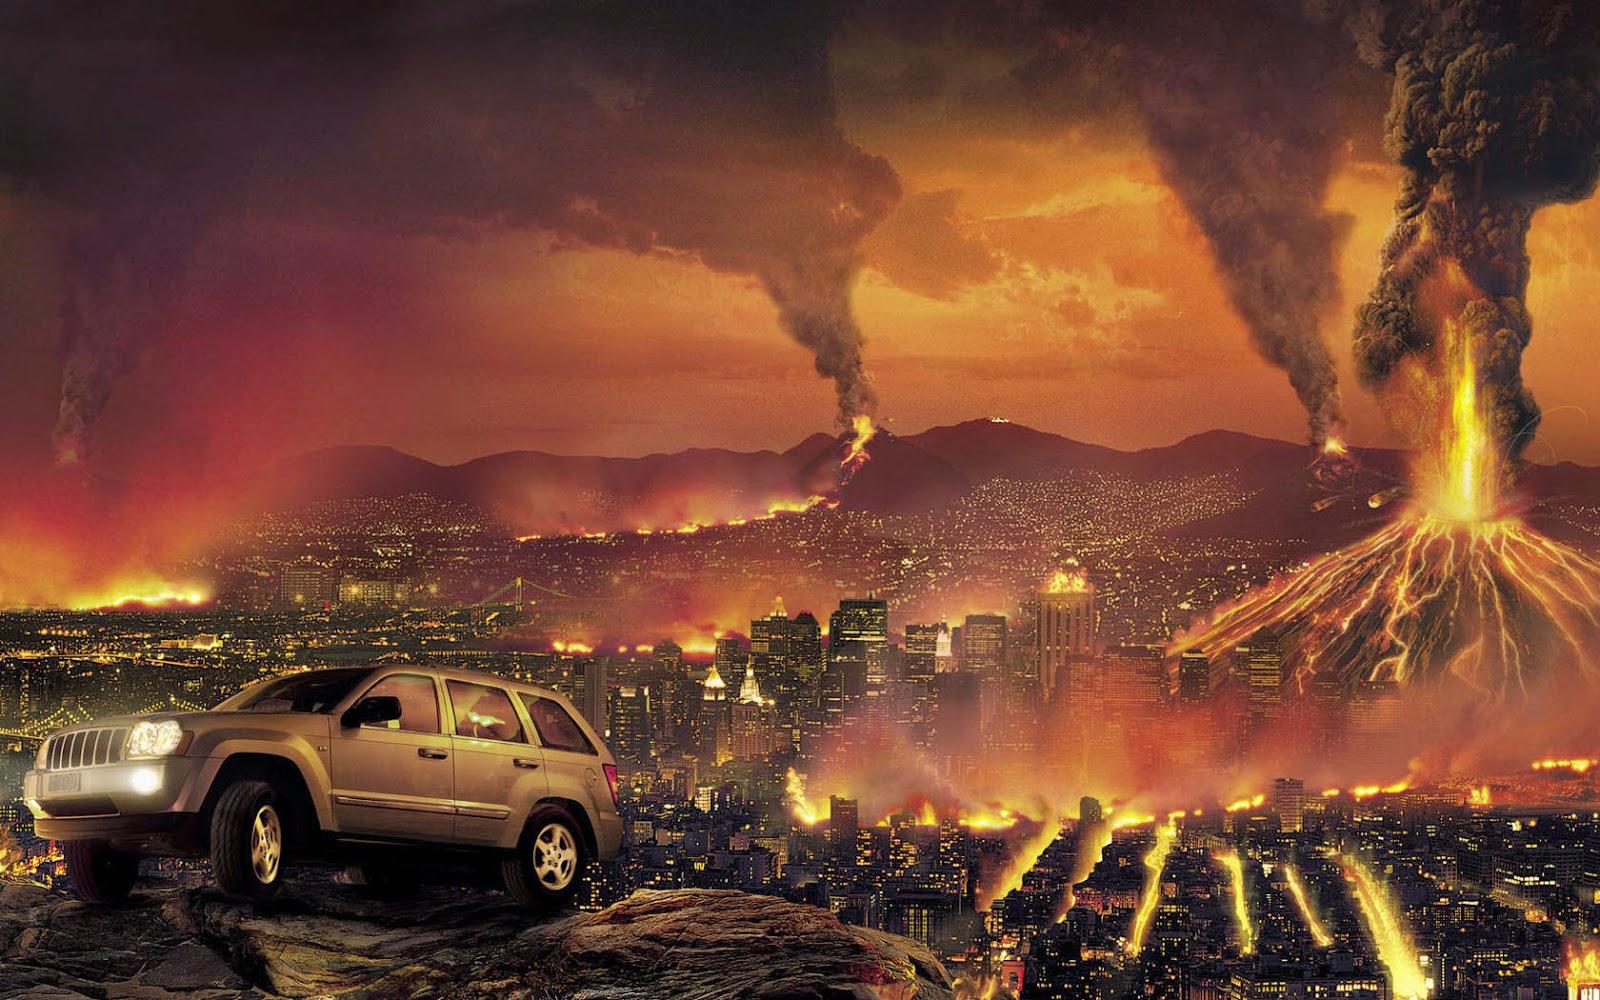 suv car landscape city destroyed wallpaper hd background free